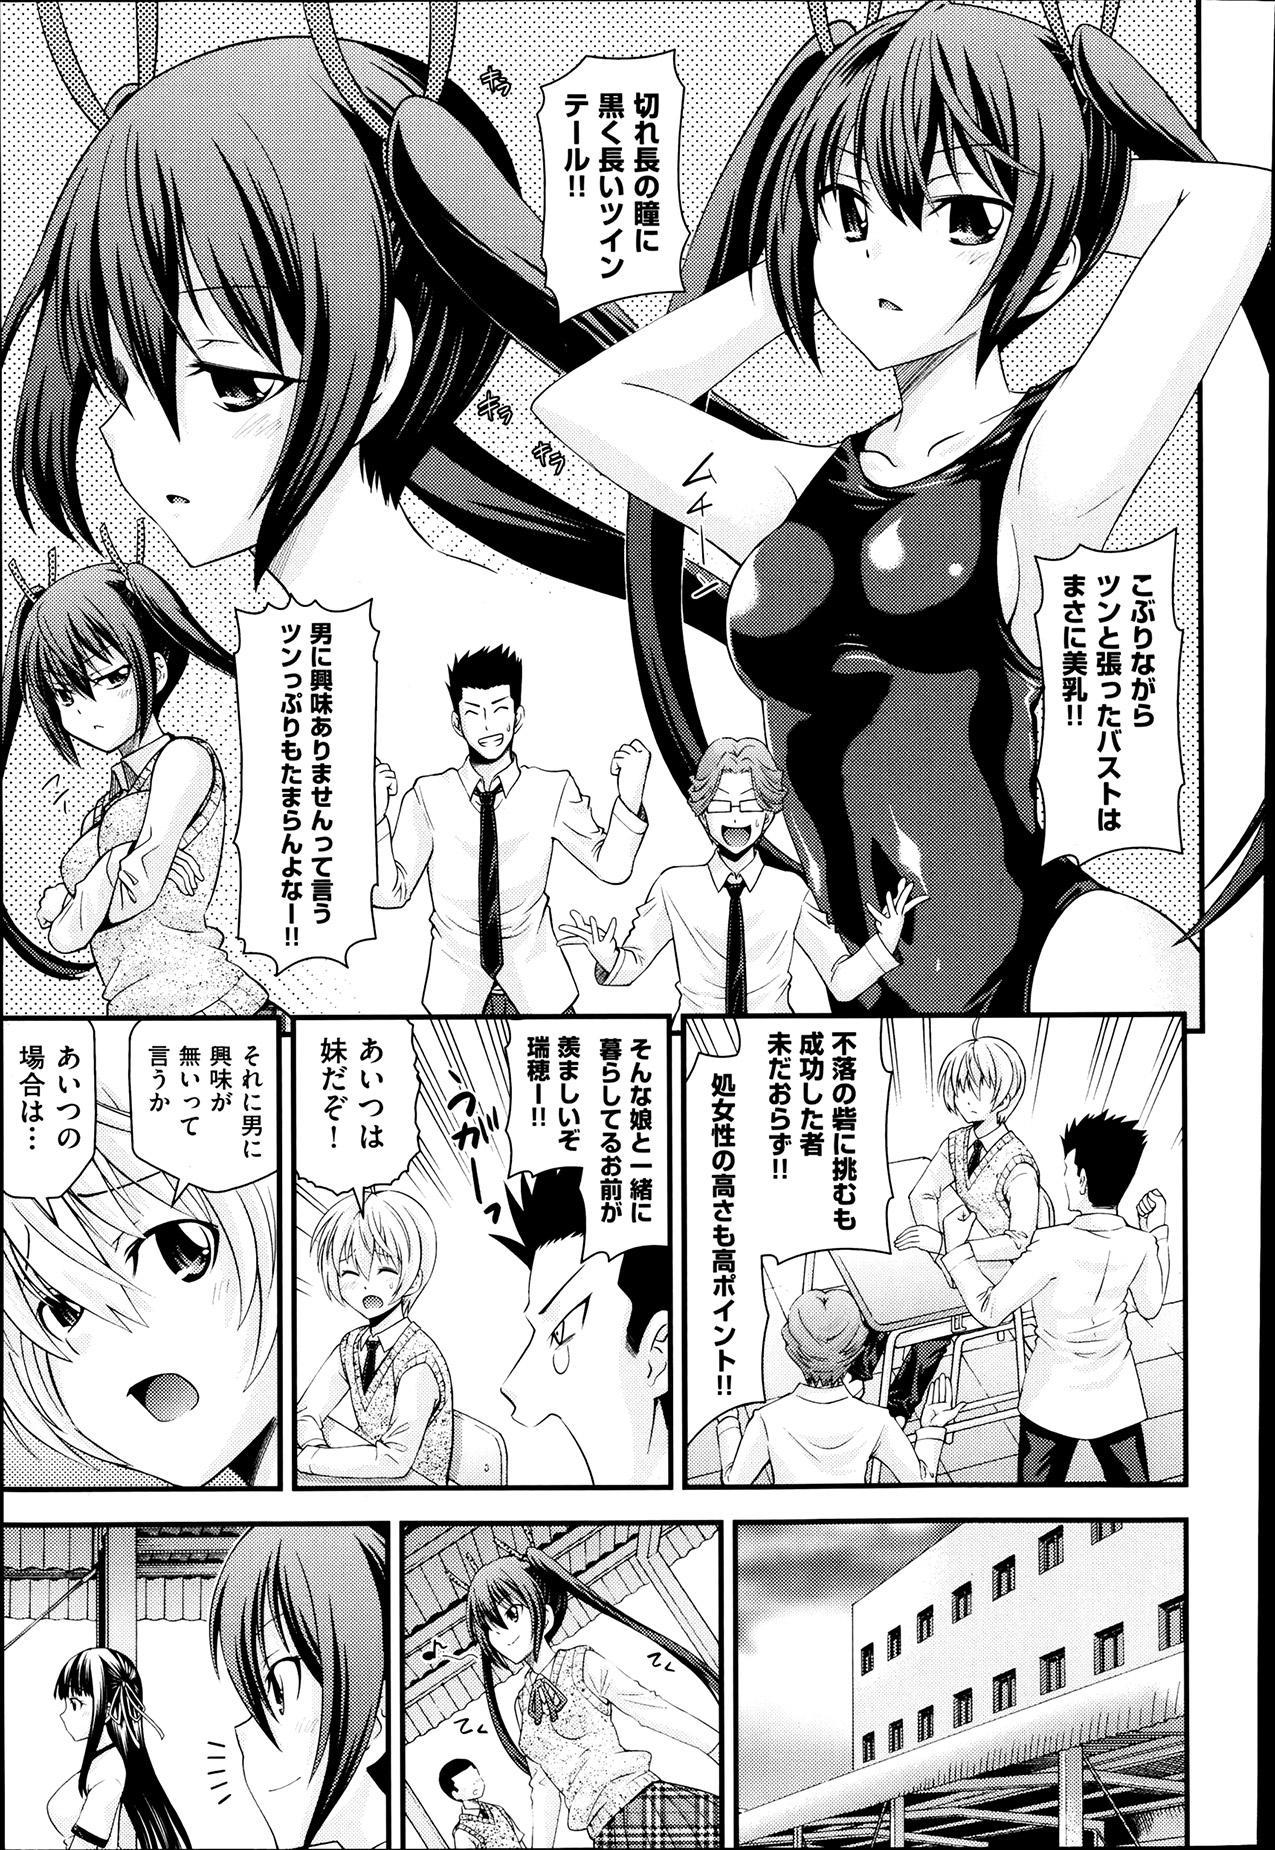 Kyoudai Replace 4